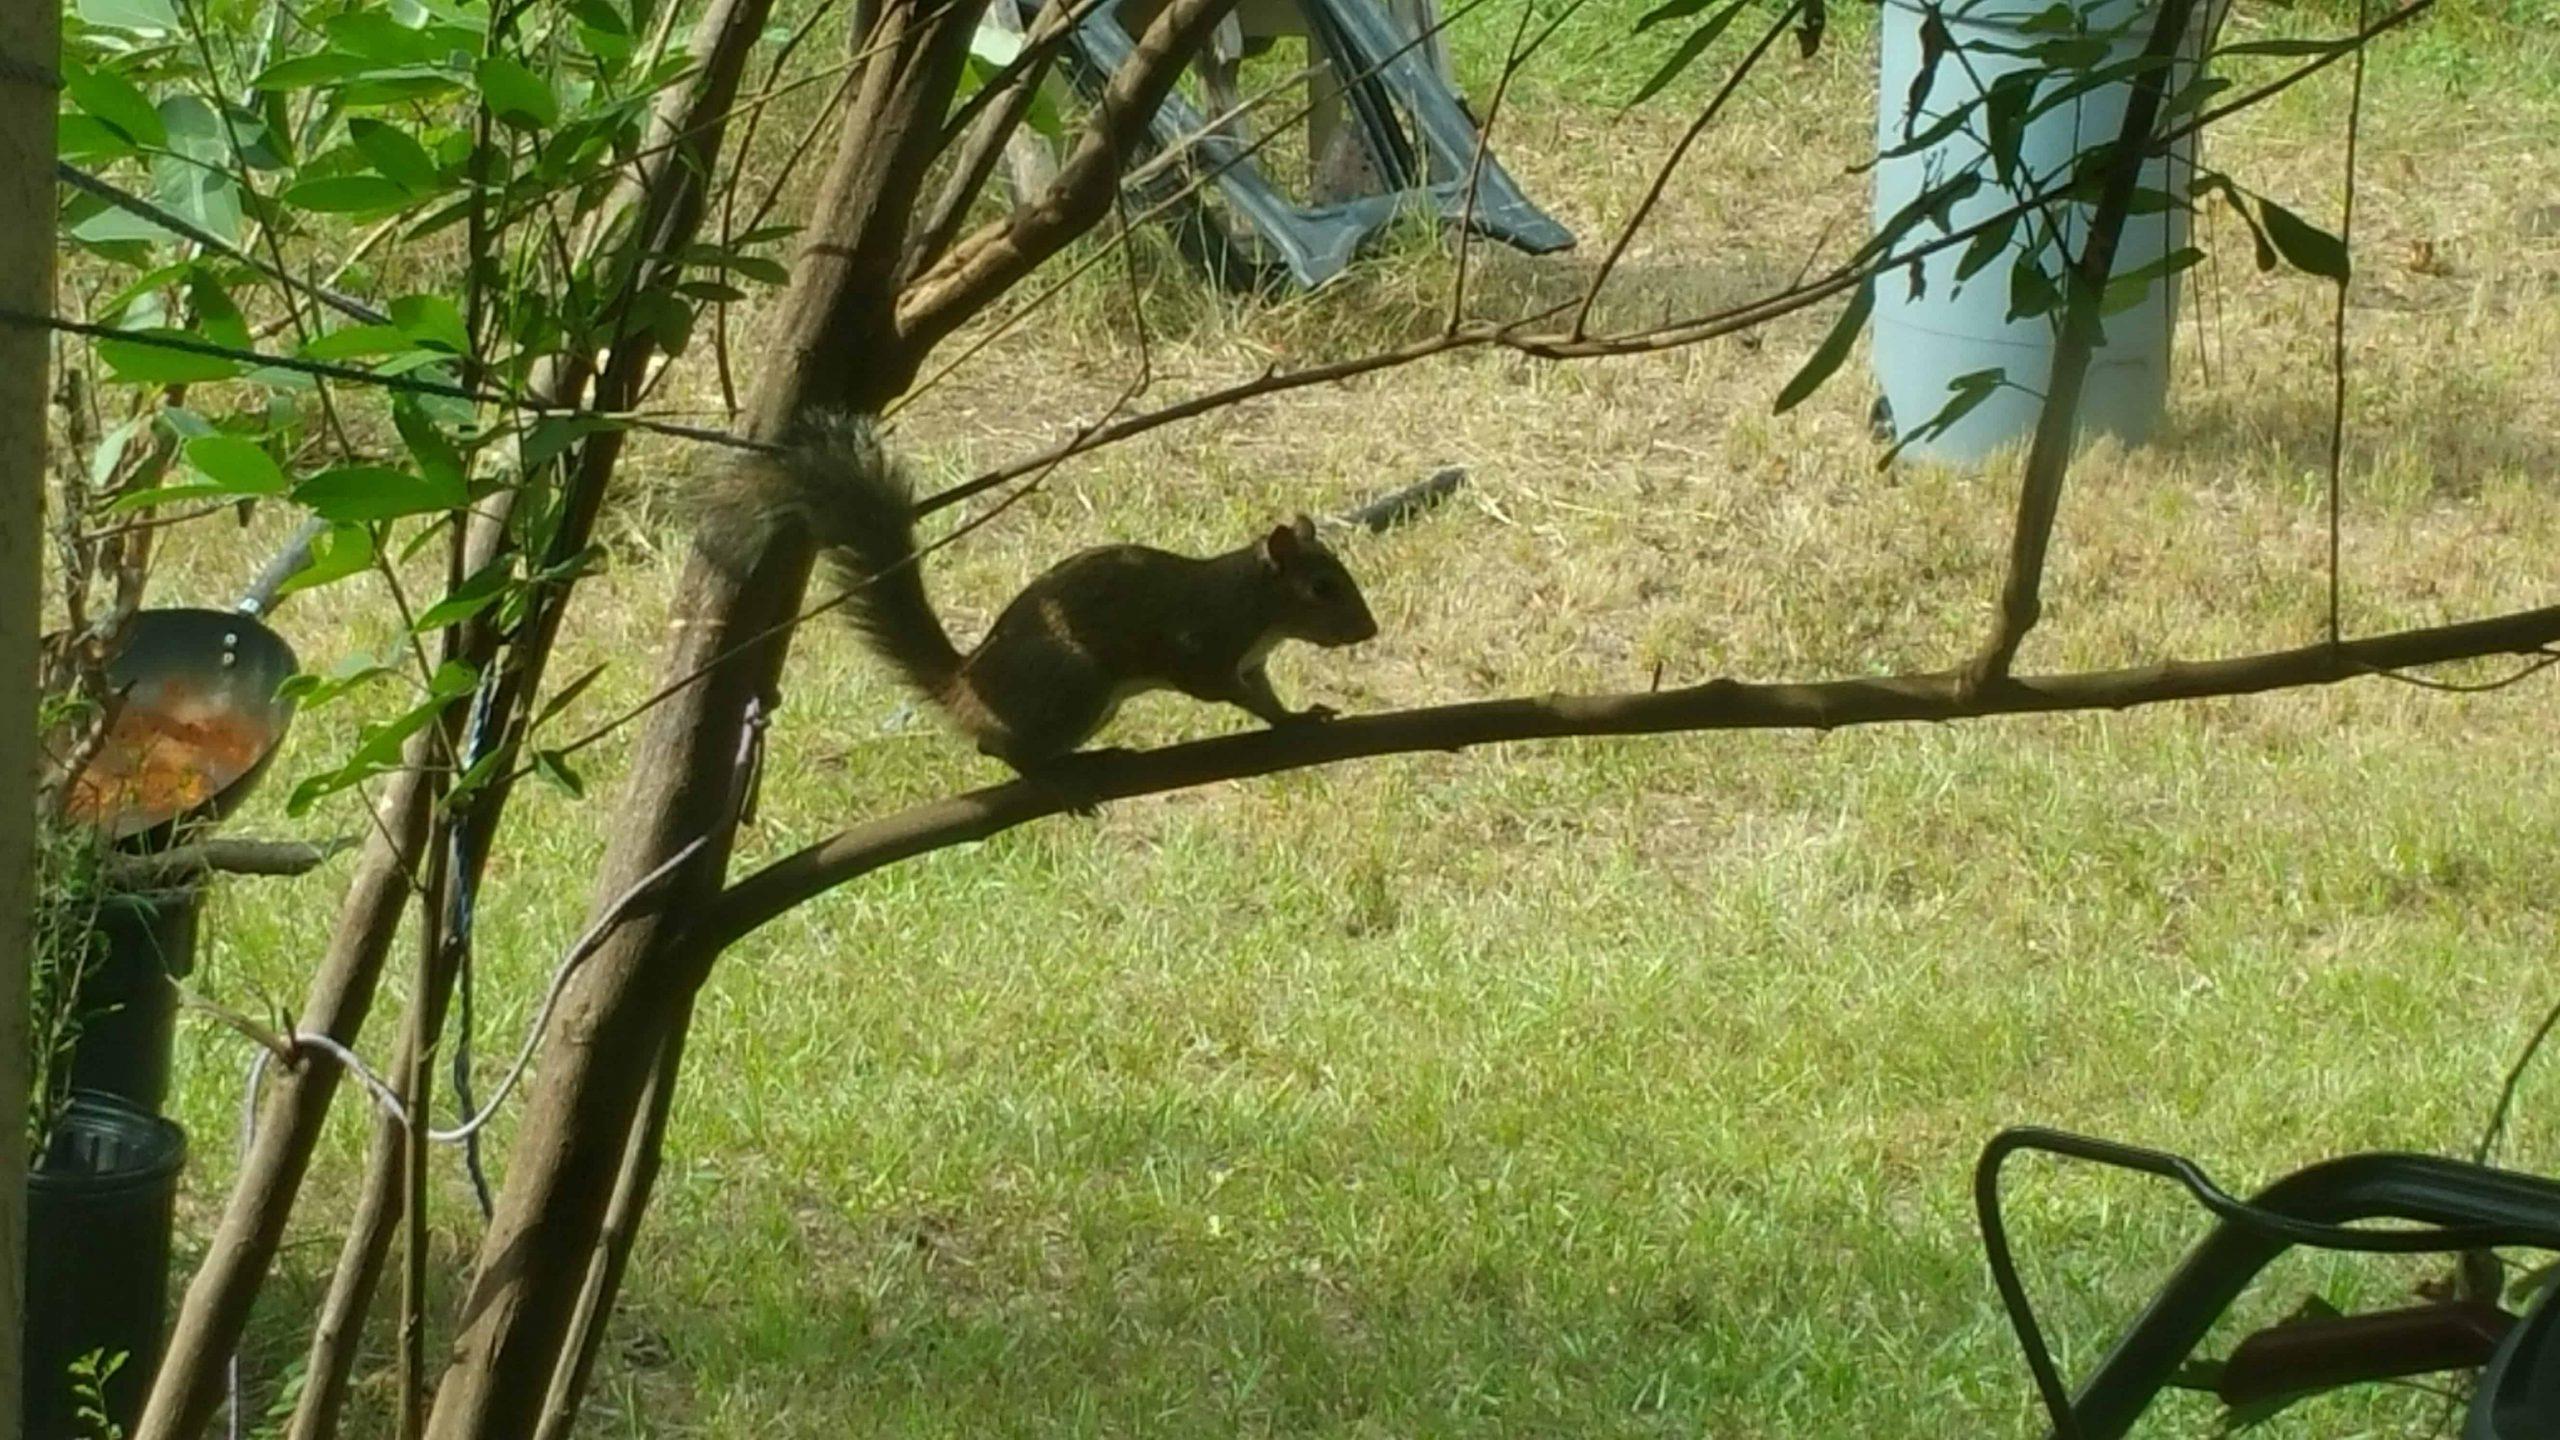 Squirrel - December 6, 2017 - 7